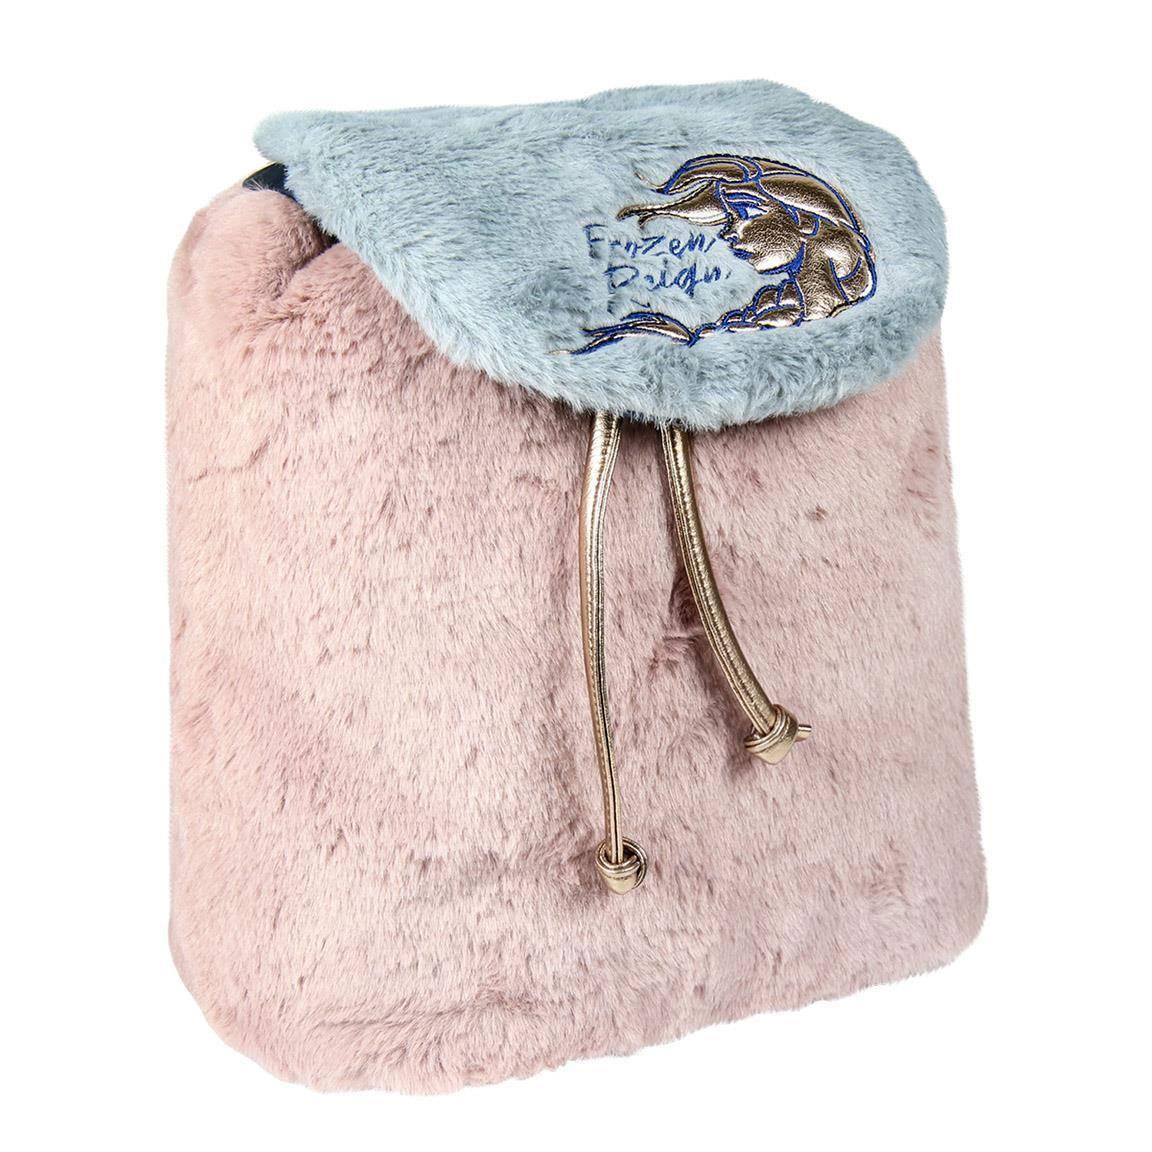 Frozen 2 Plush Backpack Elsa 23 x 25 x 12 cm